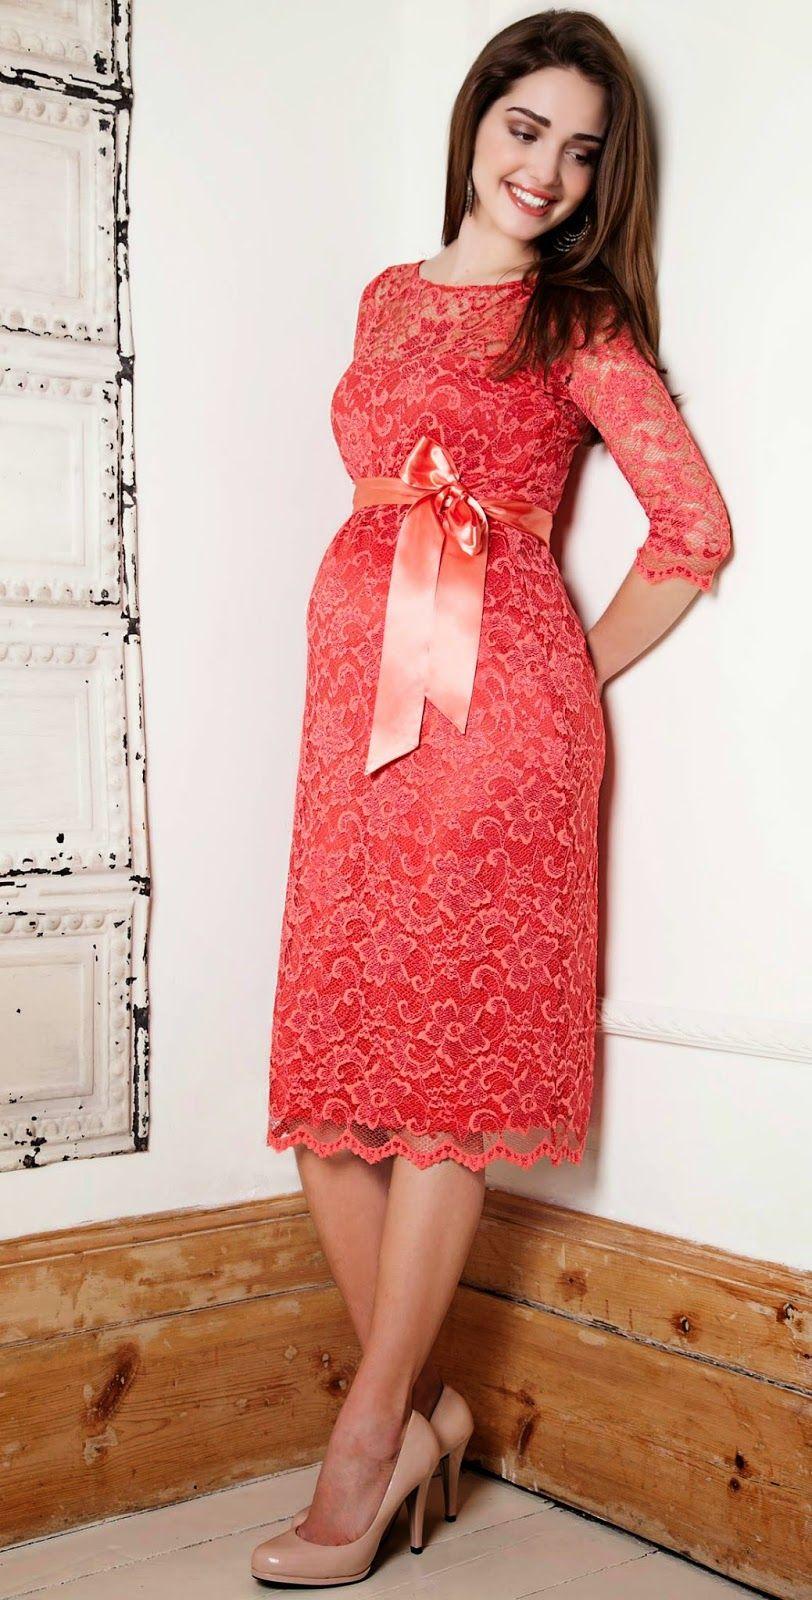 Modas de vestidos de fiesta para embarazadas